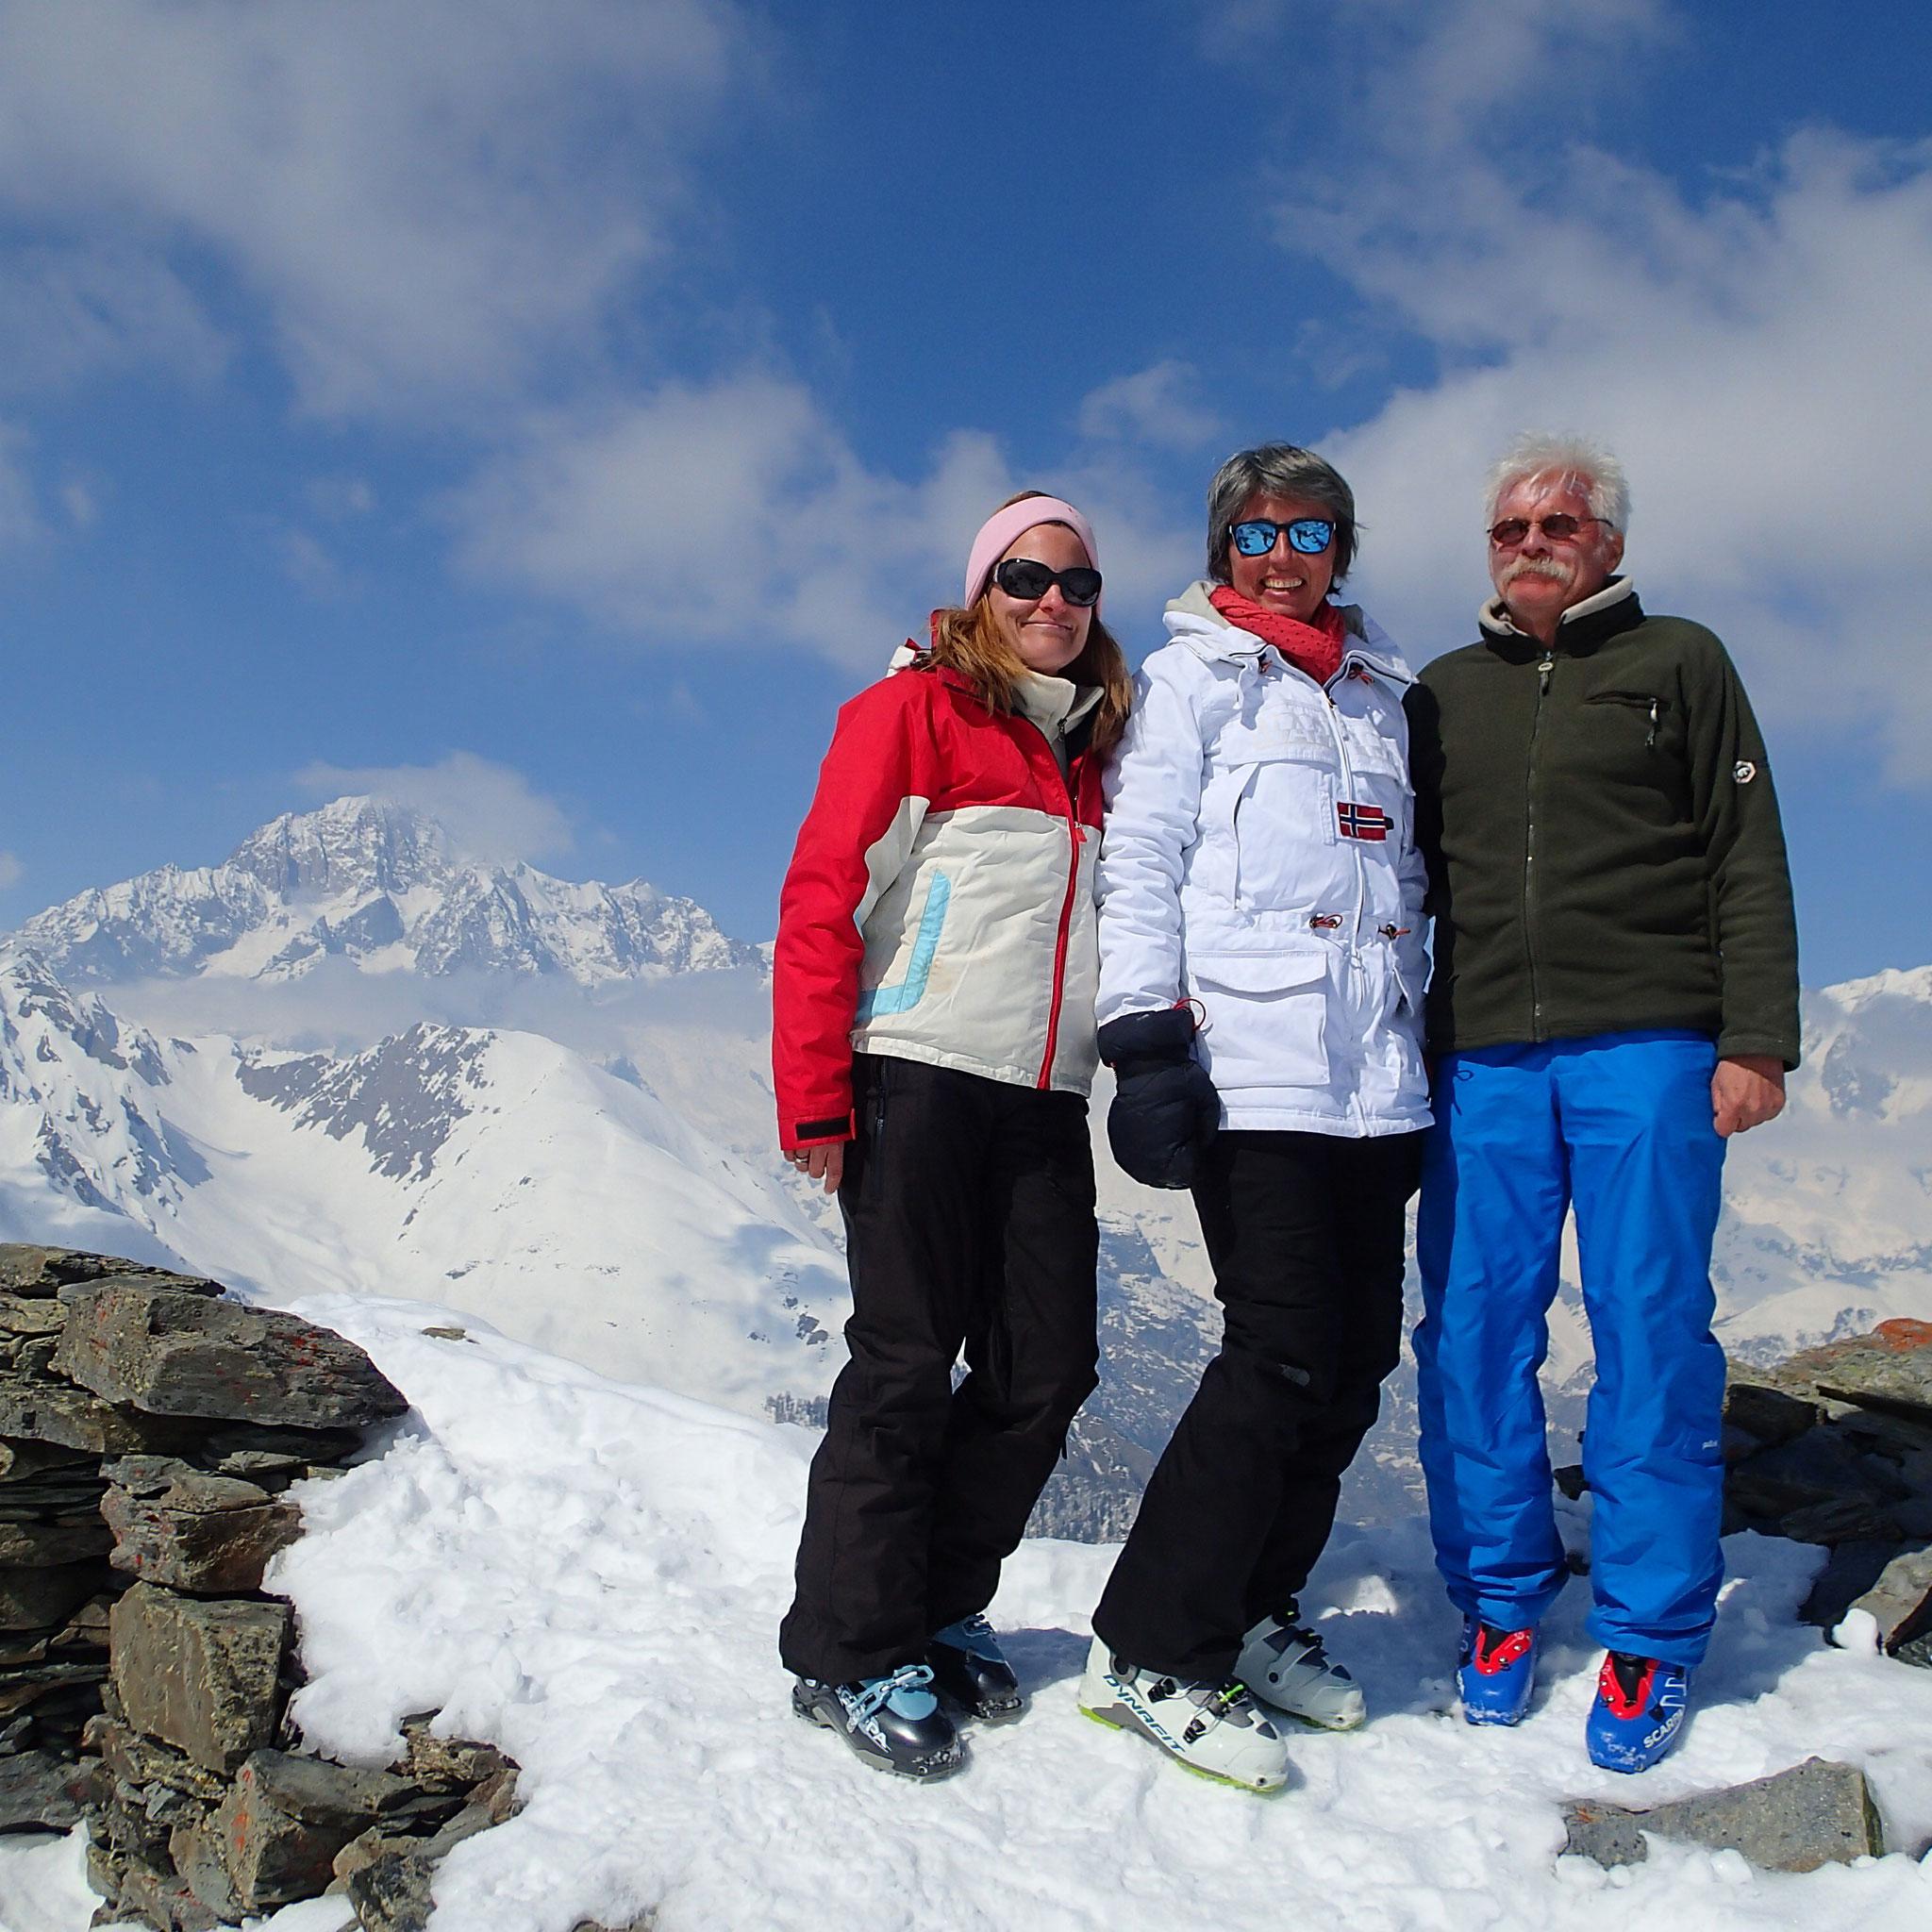 Sommet avec vue Mt-Blanc ! Bravo !